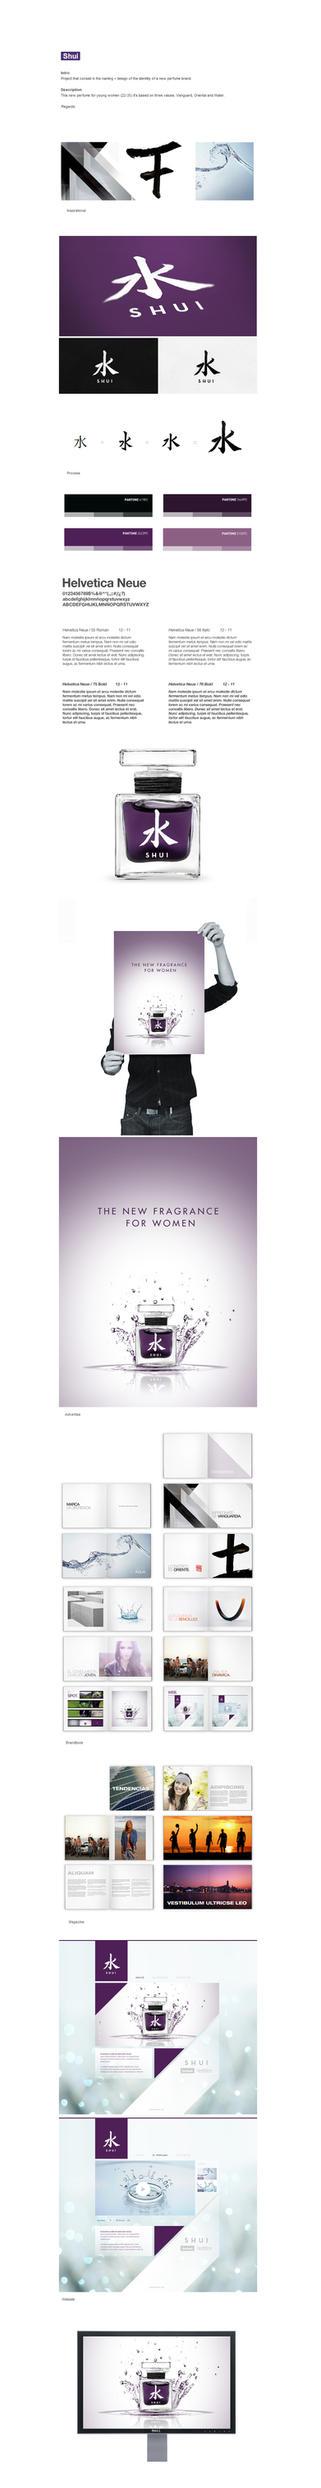 Shui perfume by yagosanz